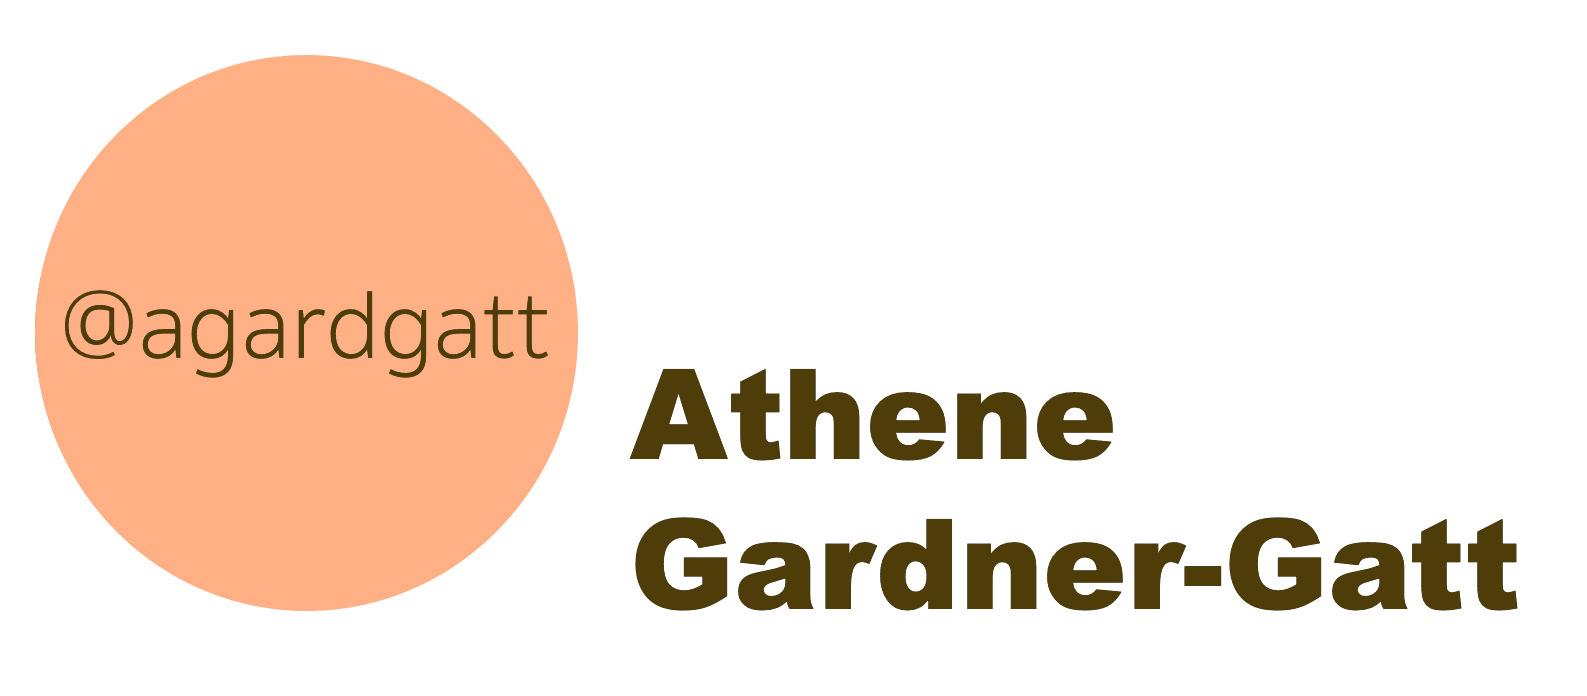 Amelia Gardner-Gatt